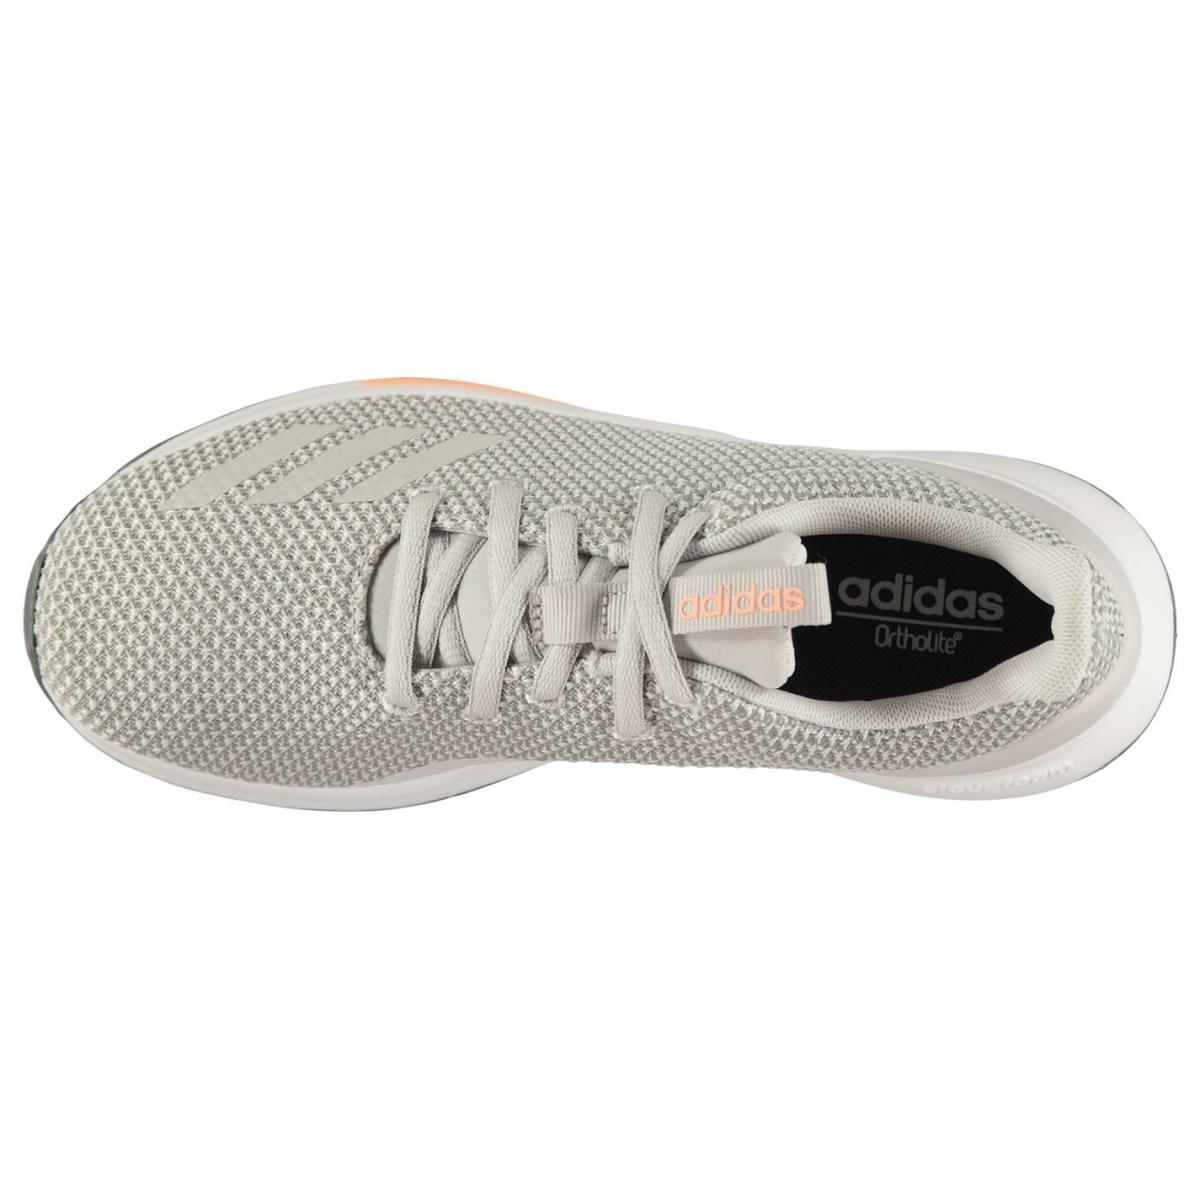 adidas-Puremotion-Turnschuhe-Damen-Sneaker-Sportschuhe-Laufschuhe-1562 Indexbild 7